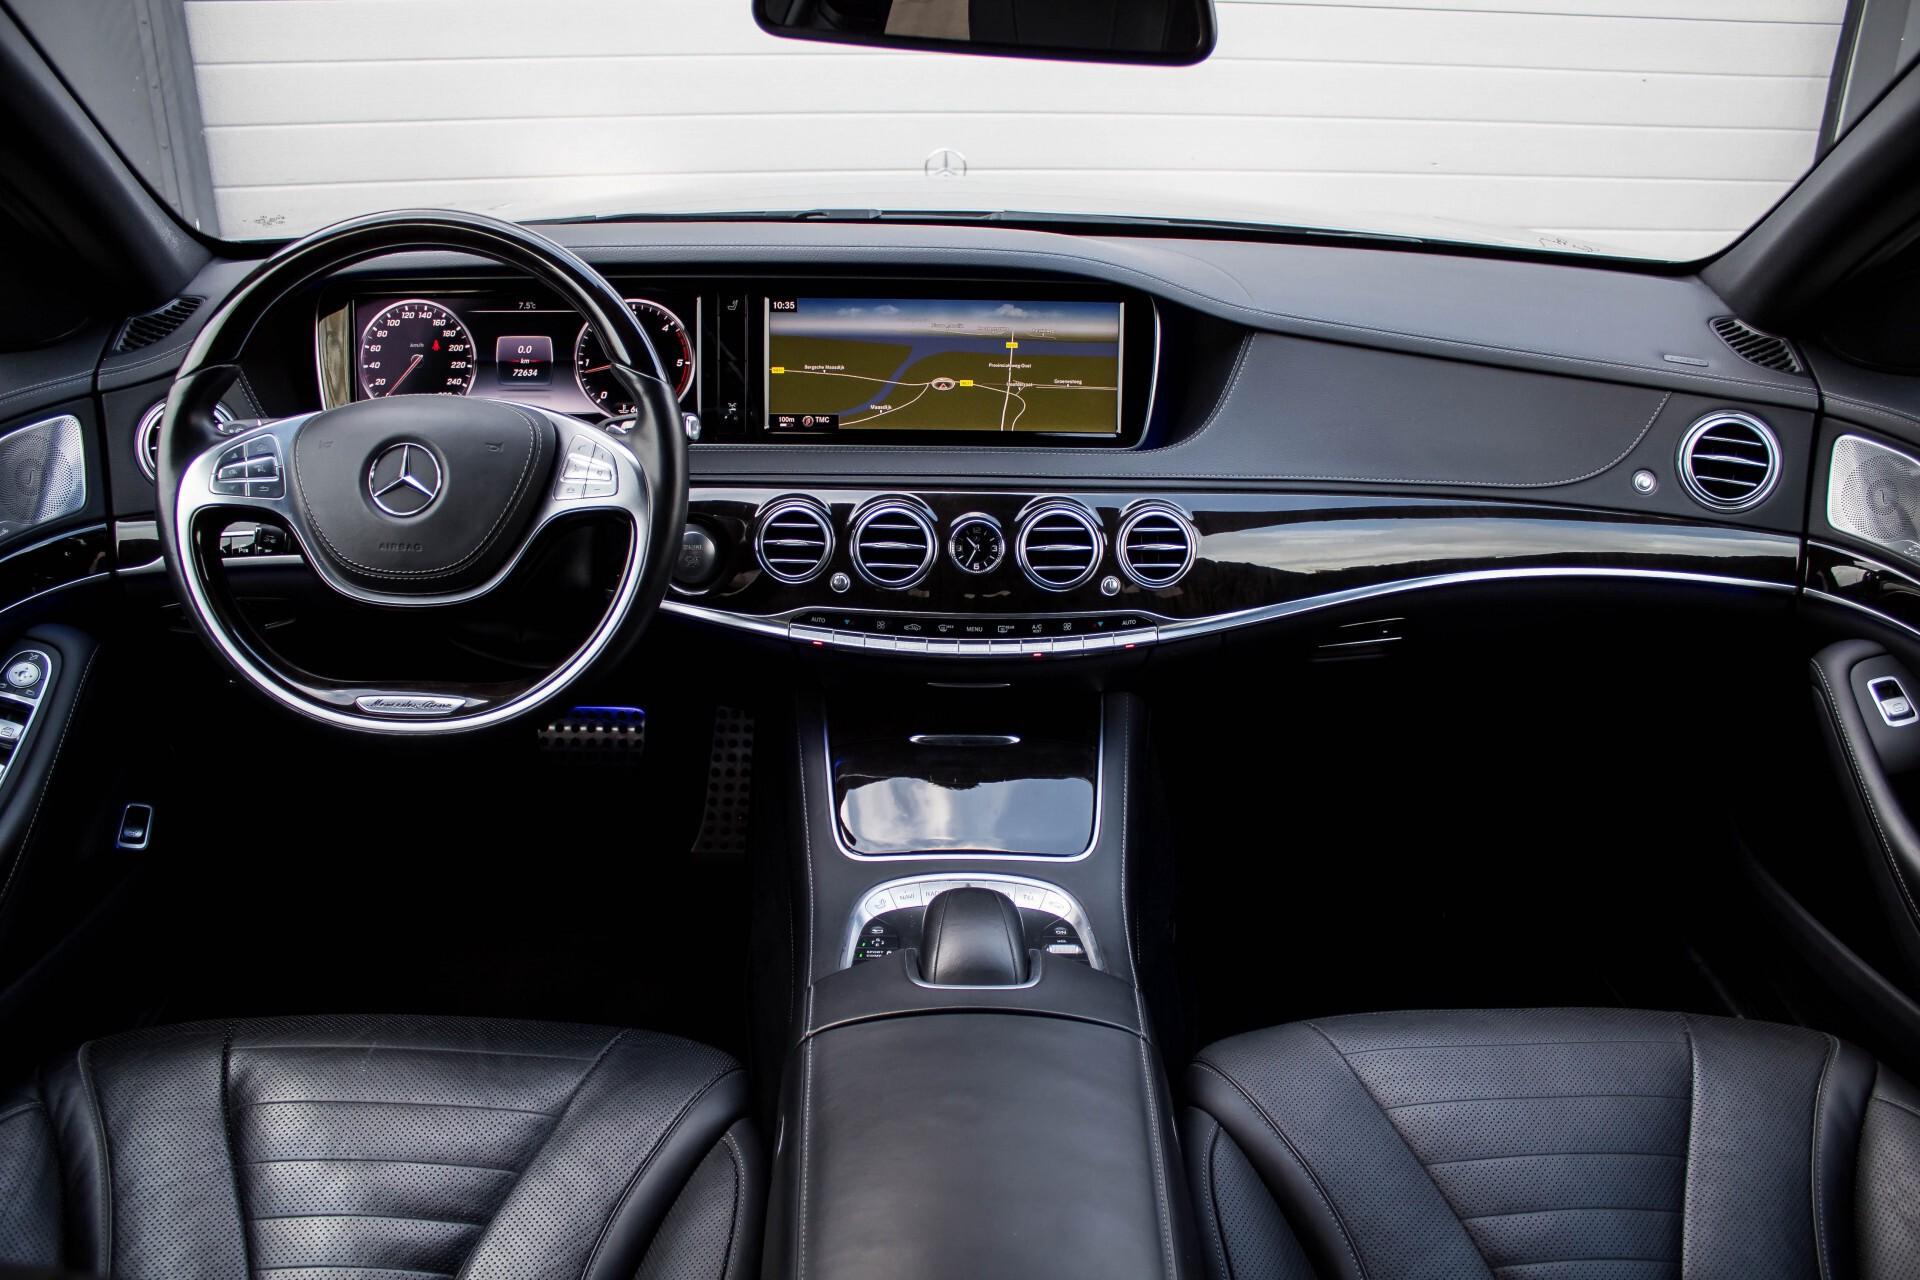 Mercedes-Benz S-Klasse 350 BlueTEC 63 AMG Panorama/Distronic/Keyless/Massage/Burmester Aut7 Foto 6